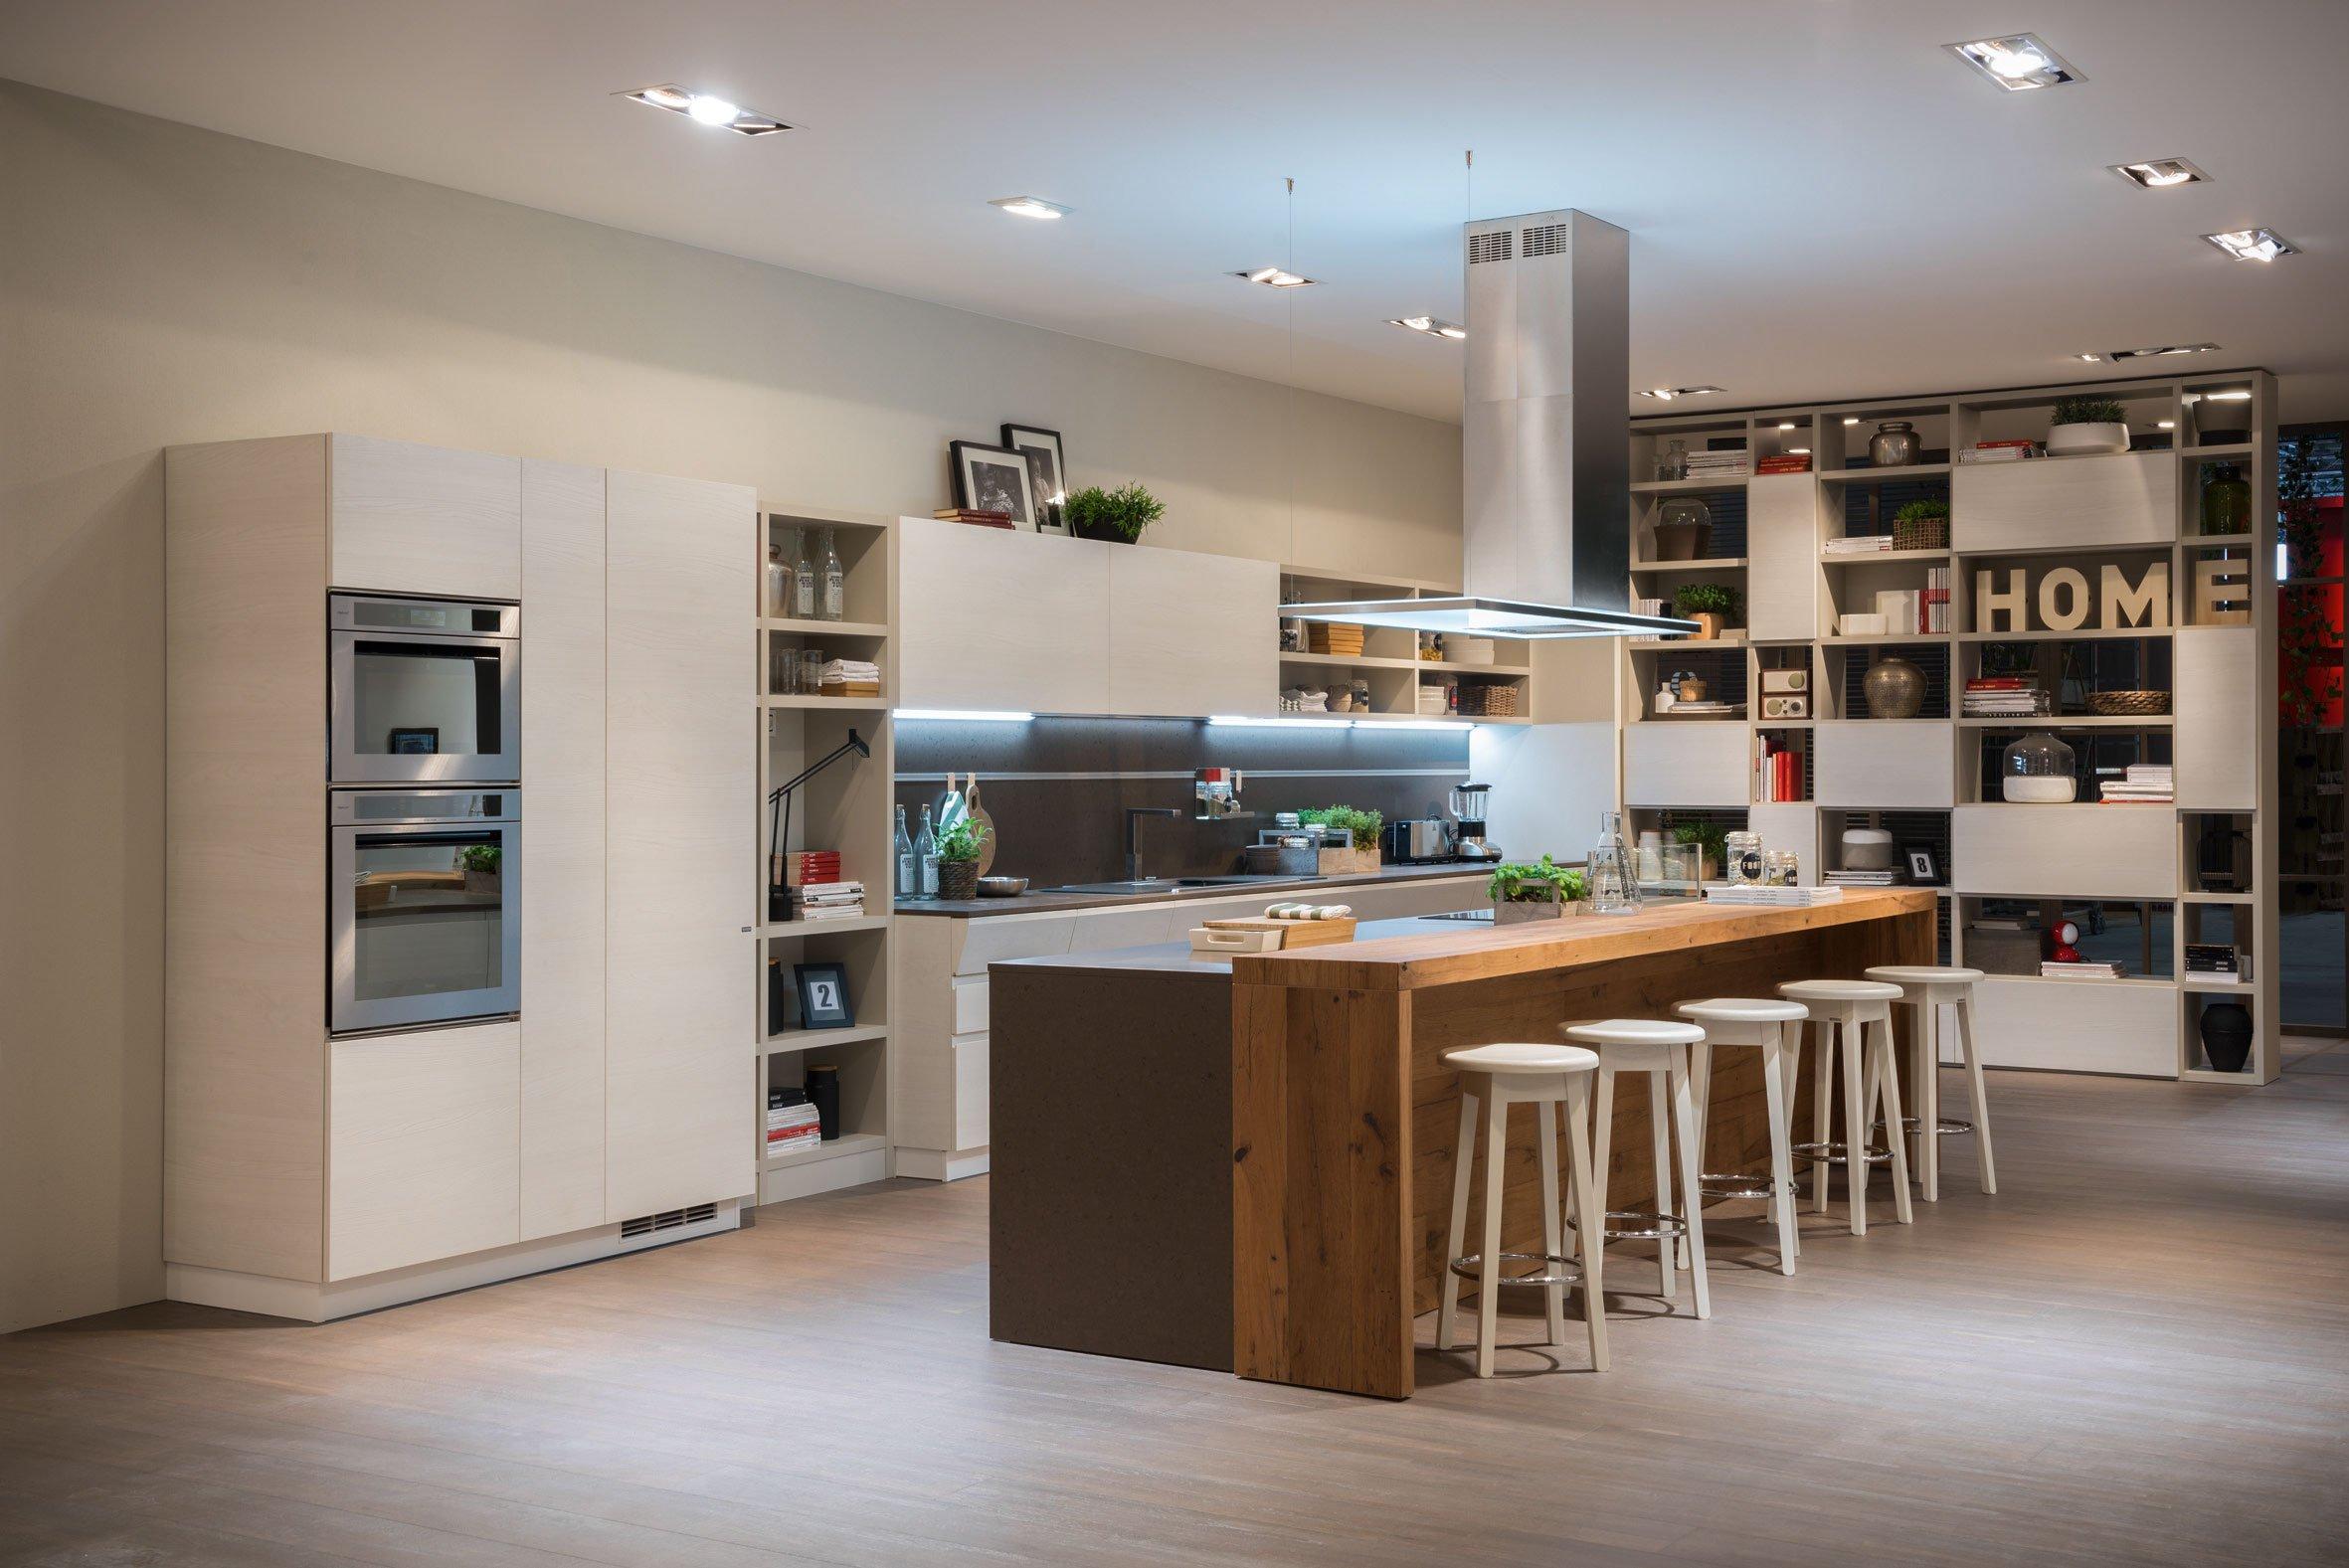 Cucina salotto ambiente unico idee rn12 regardsdefemmes for Foto salotto